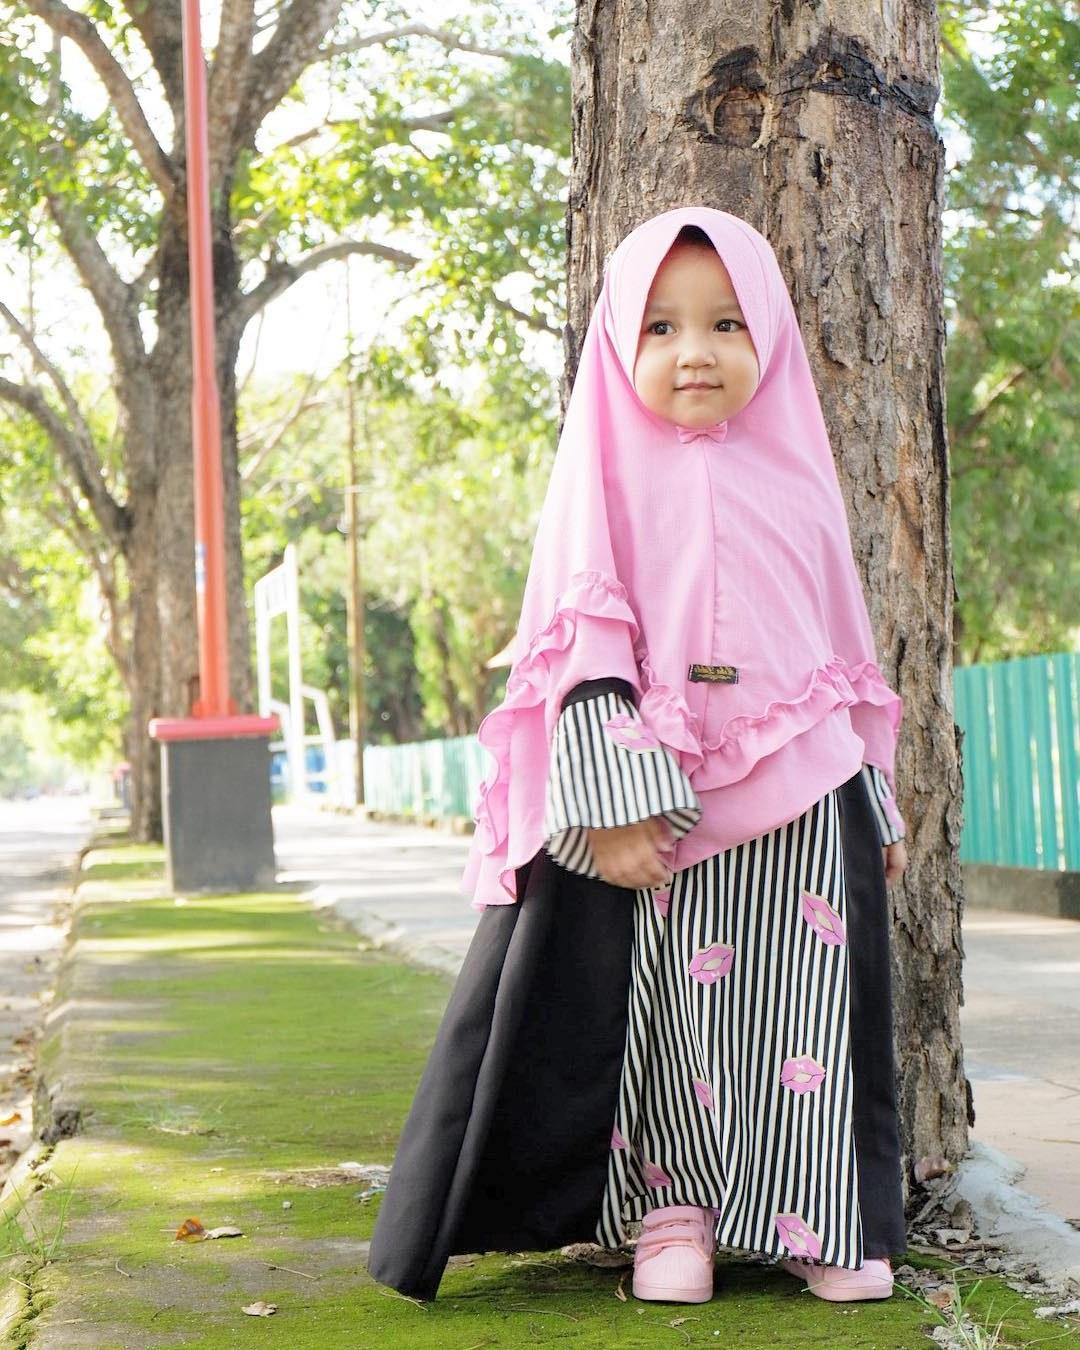 Inspirasi Gambar Baju Lebaran Anak Ftd8 Cara Mudah Memilih Baju Untuk Lebaran Anak Perempuan Yang